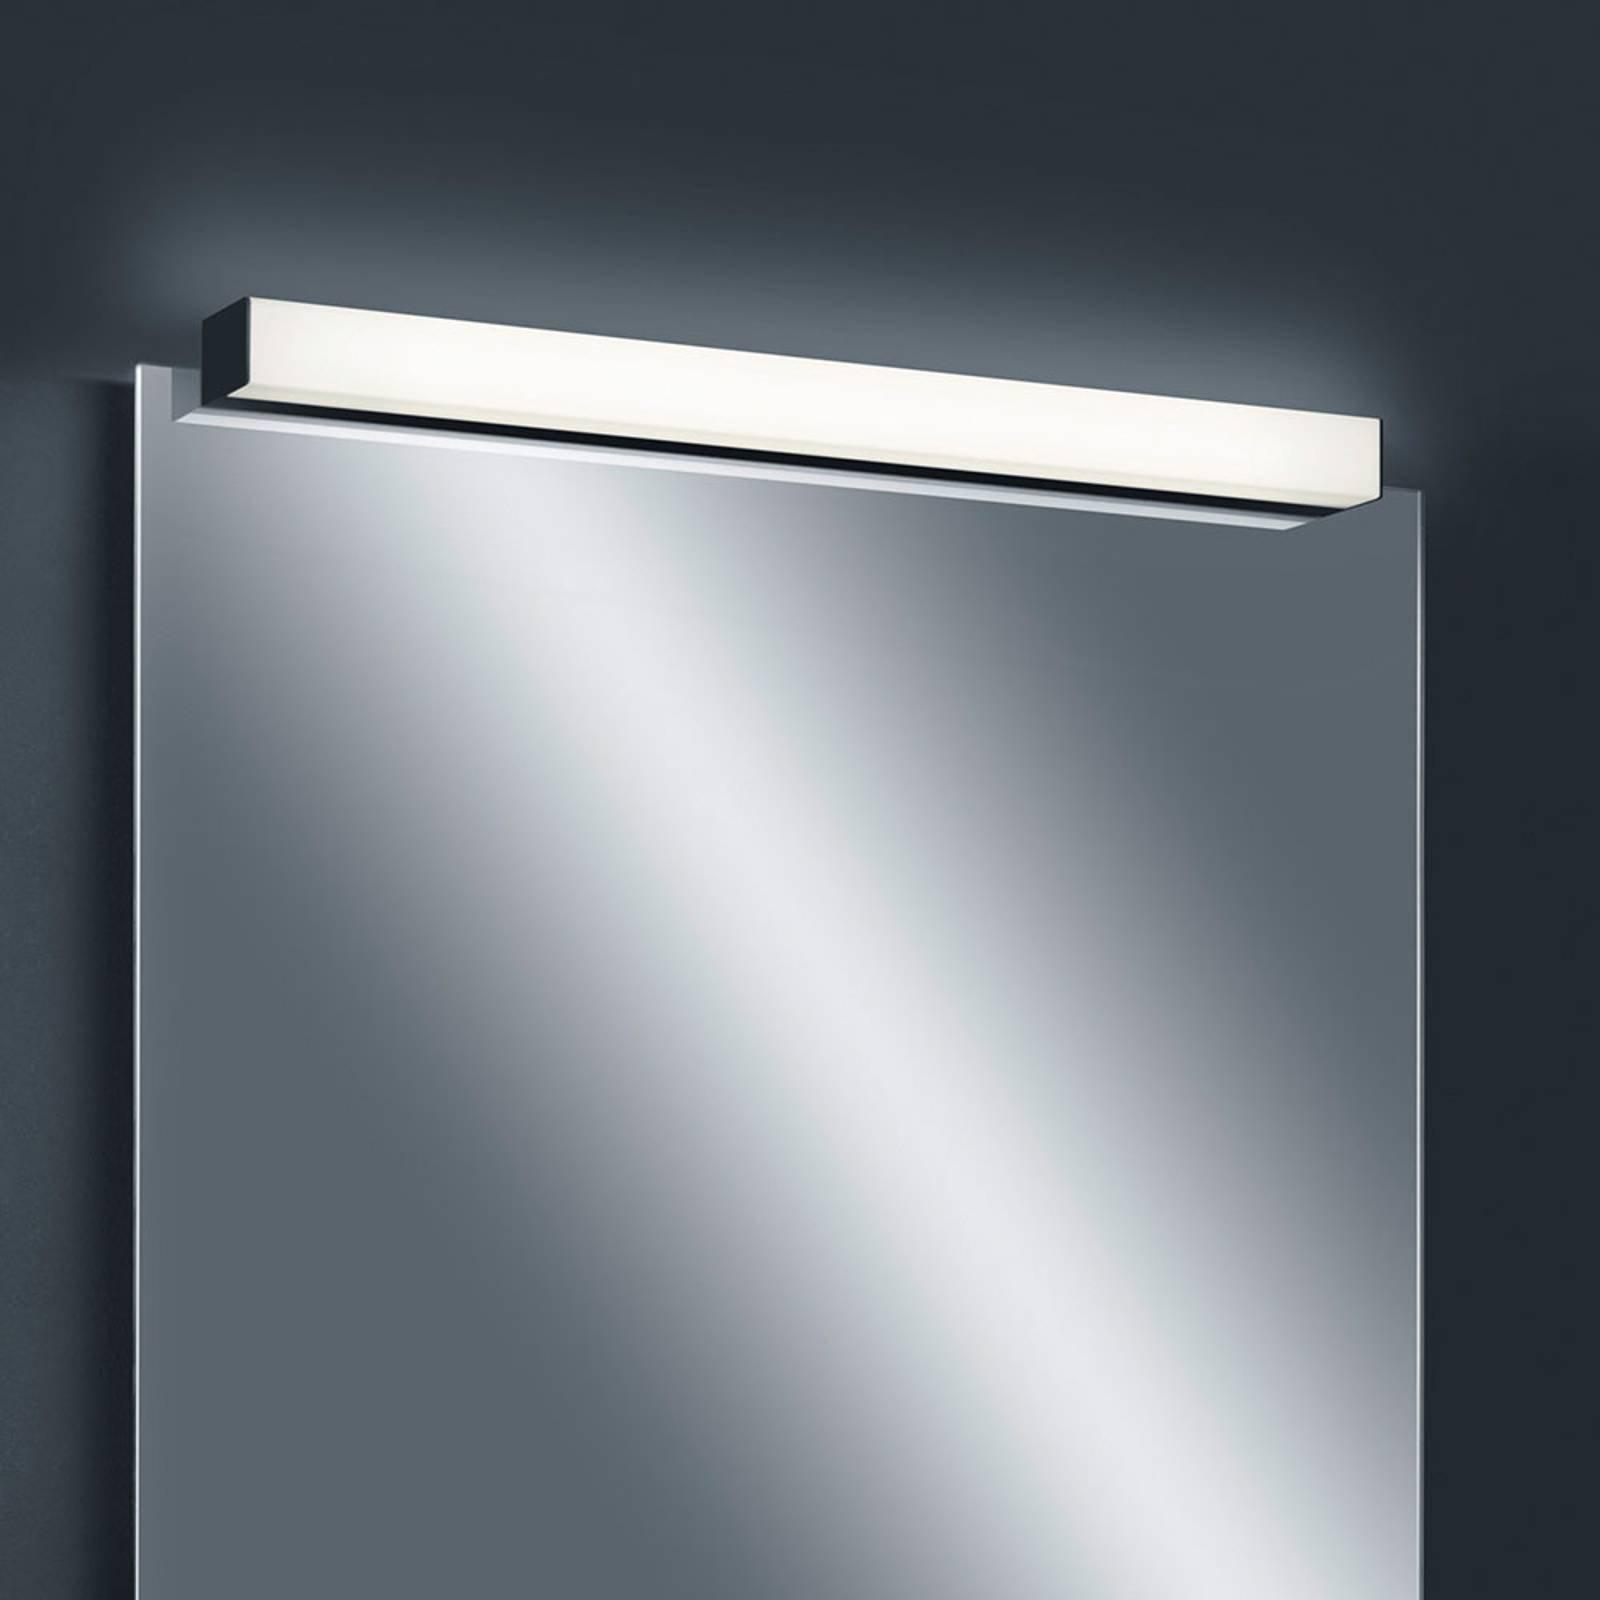 Helestra Lado LED-speillampe, svart, 120 cm